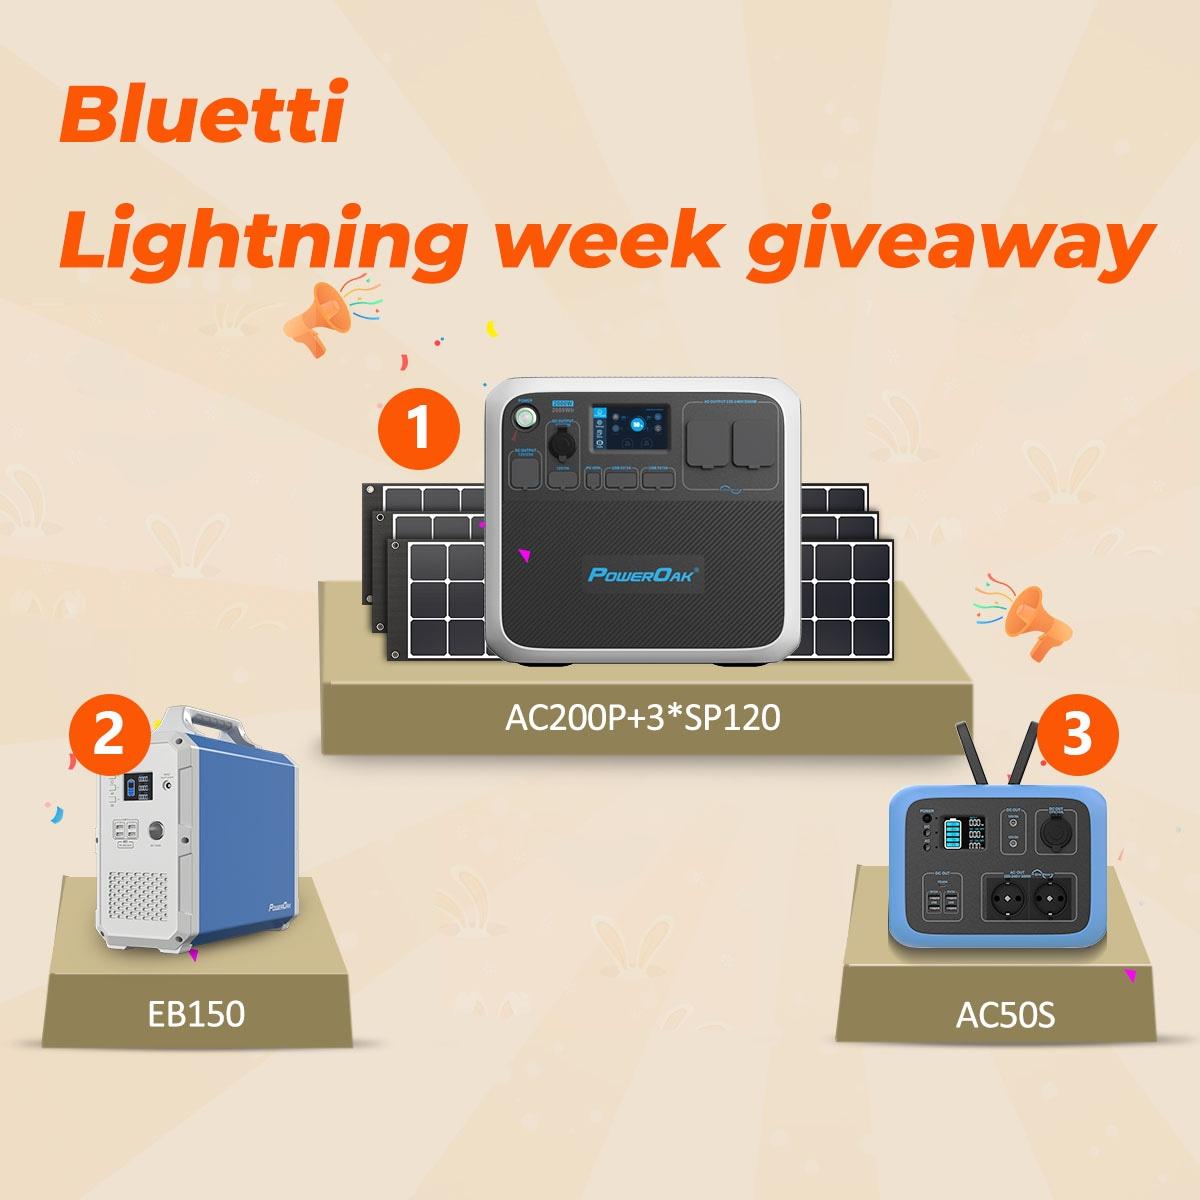 Bluetti Lightning Week Giveaway